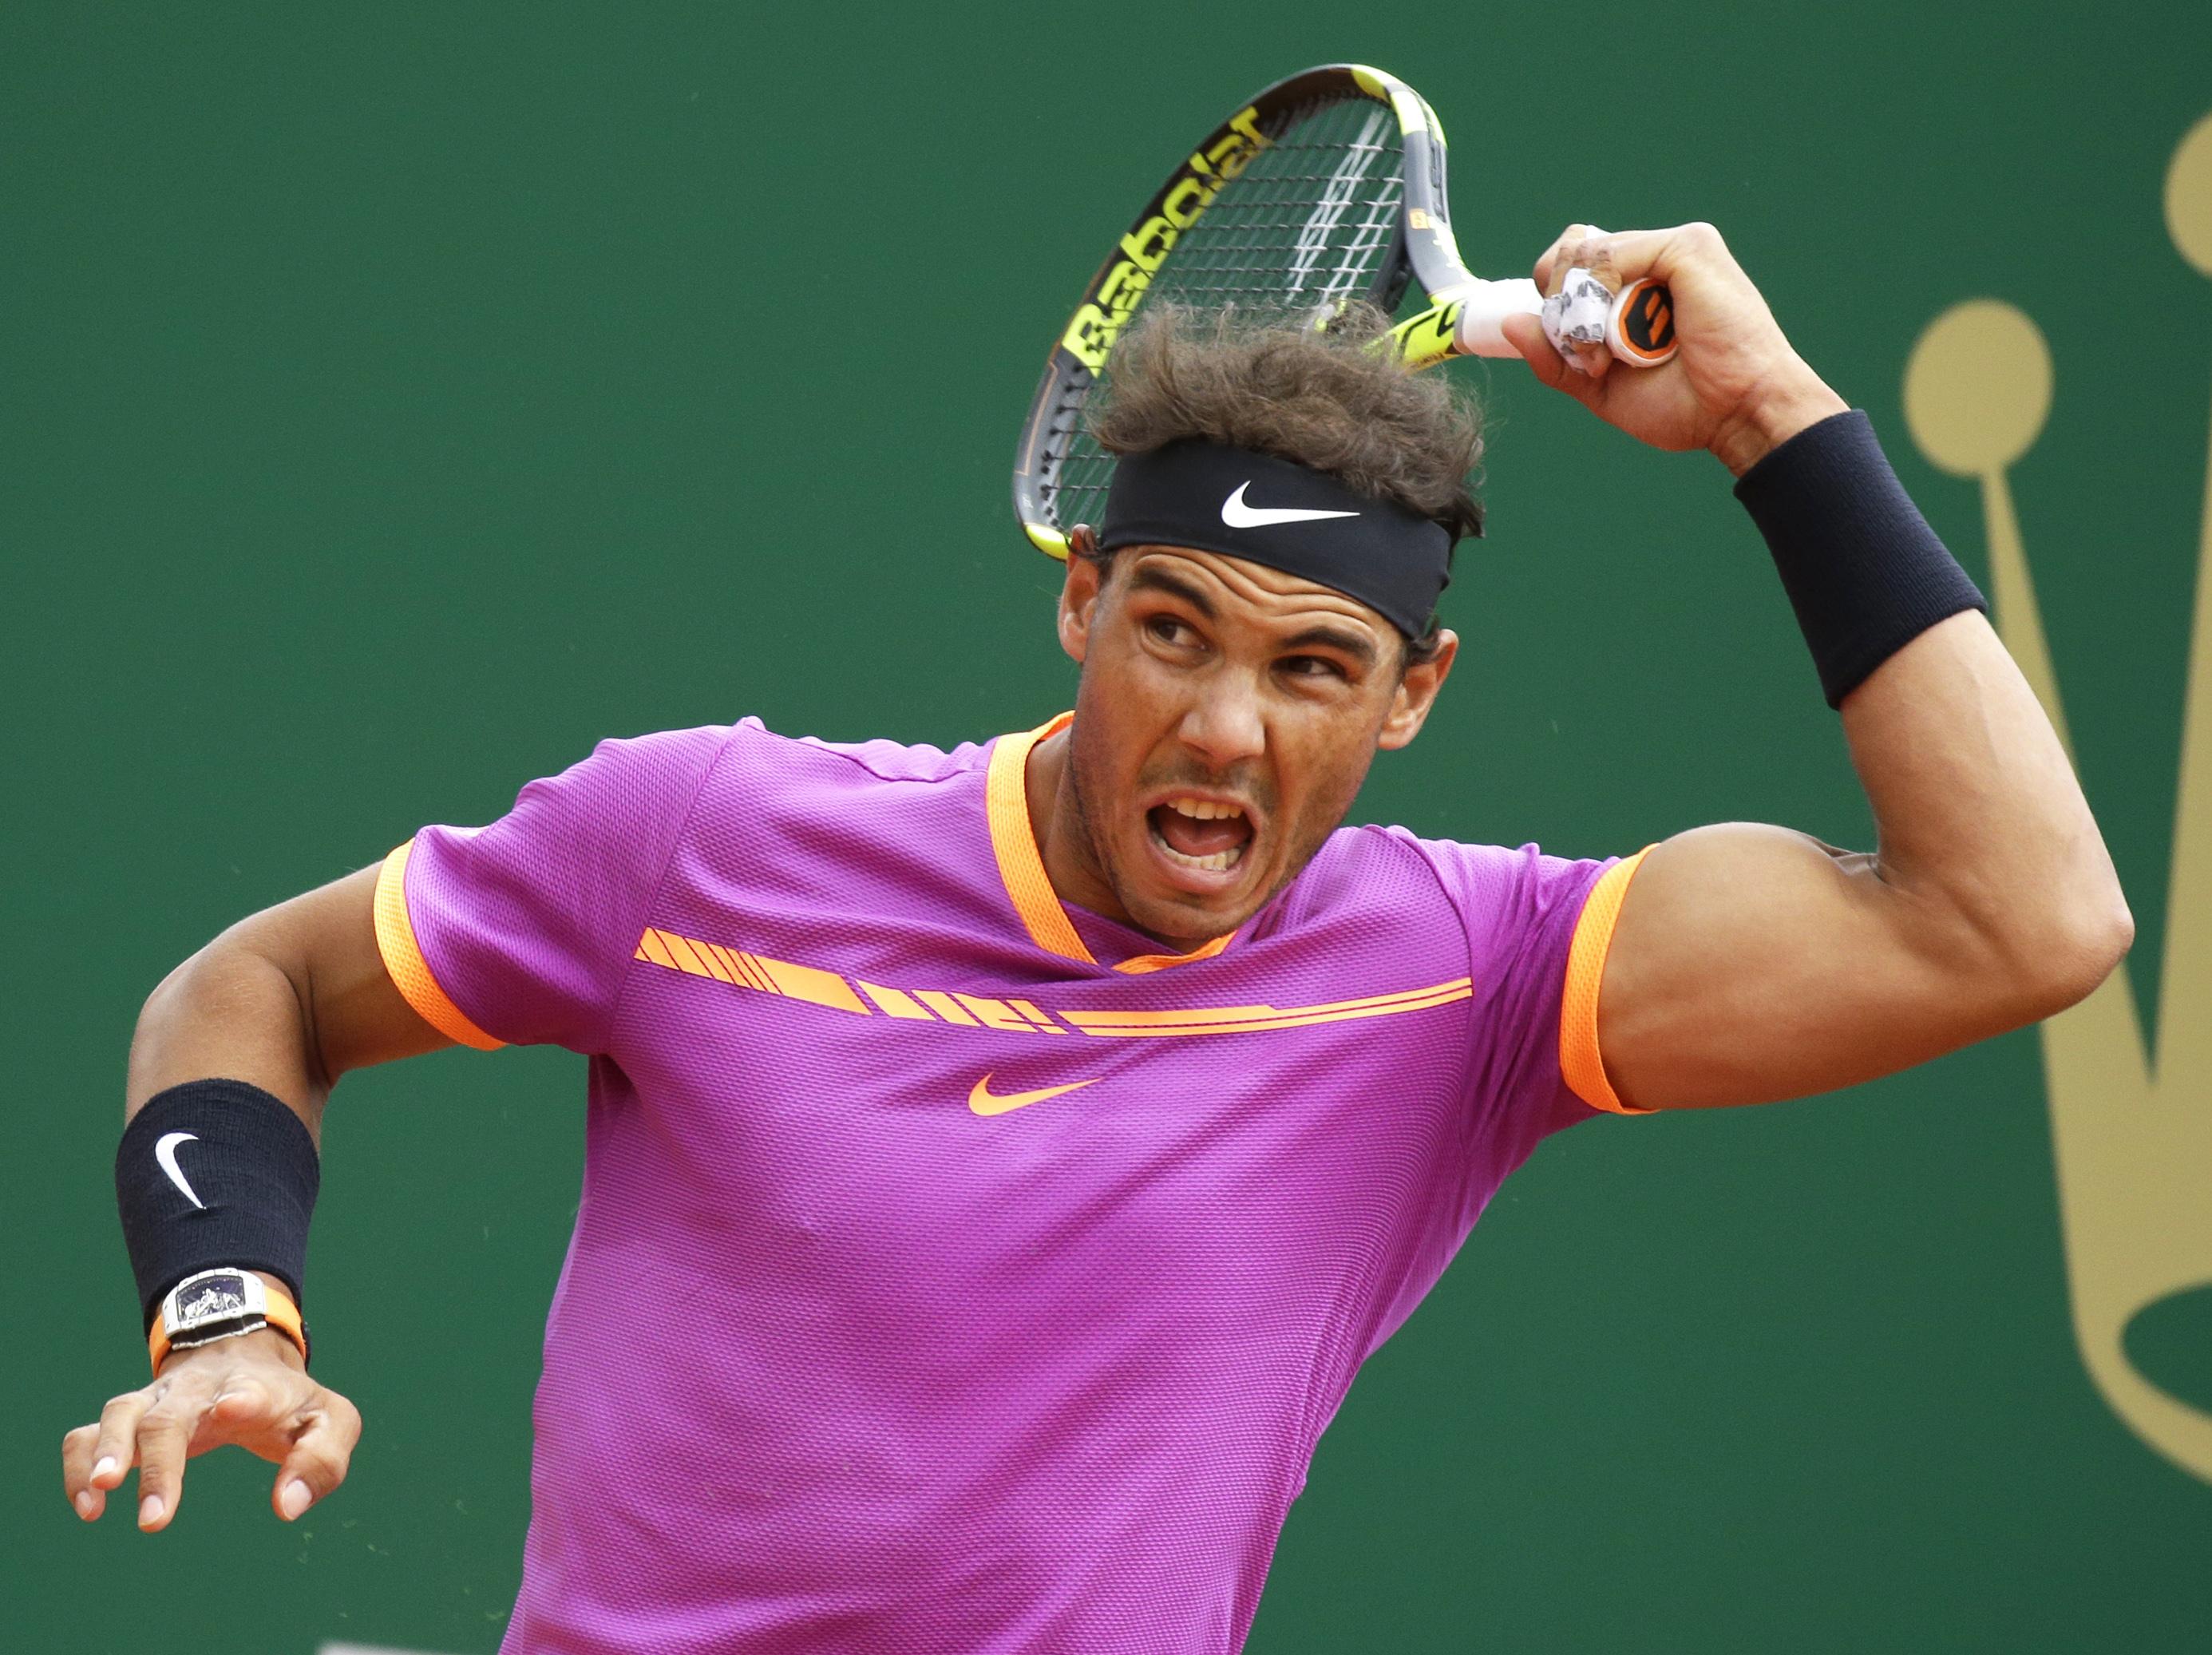 Spain's Rafael Nadal returns the ball to Spain's Albert Ramos-Vinolas during the men's final at the Monte Carlo Tennis Masters tournament in Monaco, Sunday, April, 23. (AP Photo/Claude Paris)